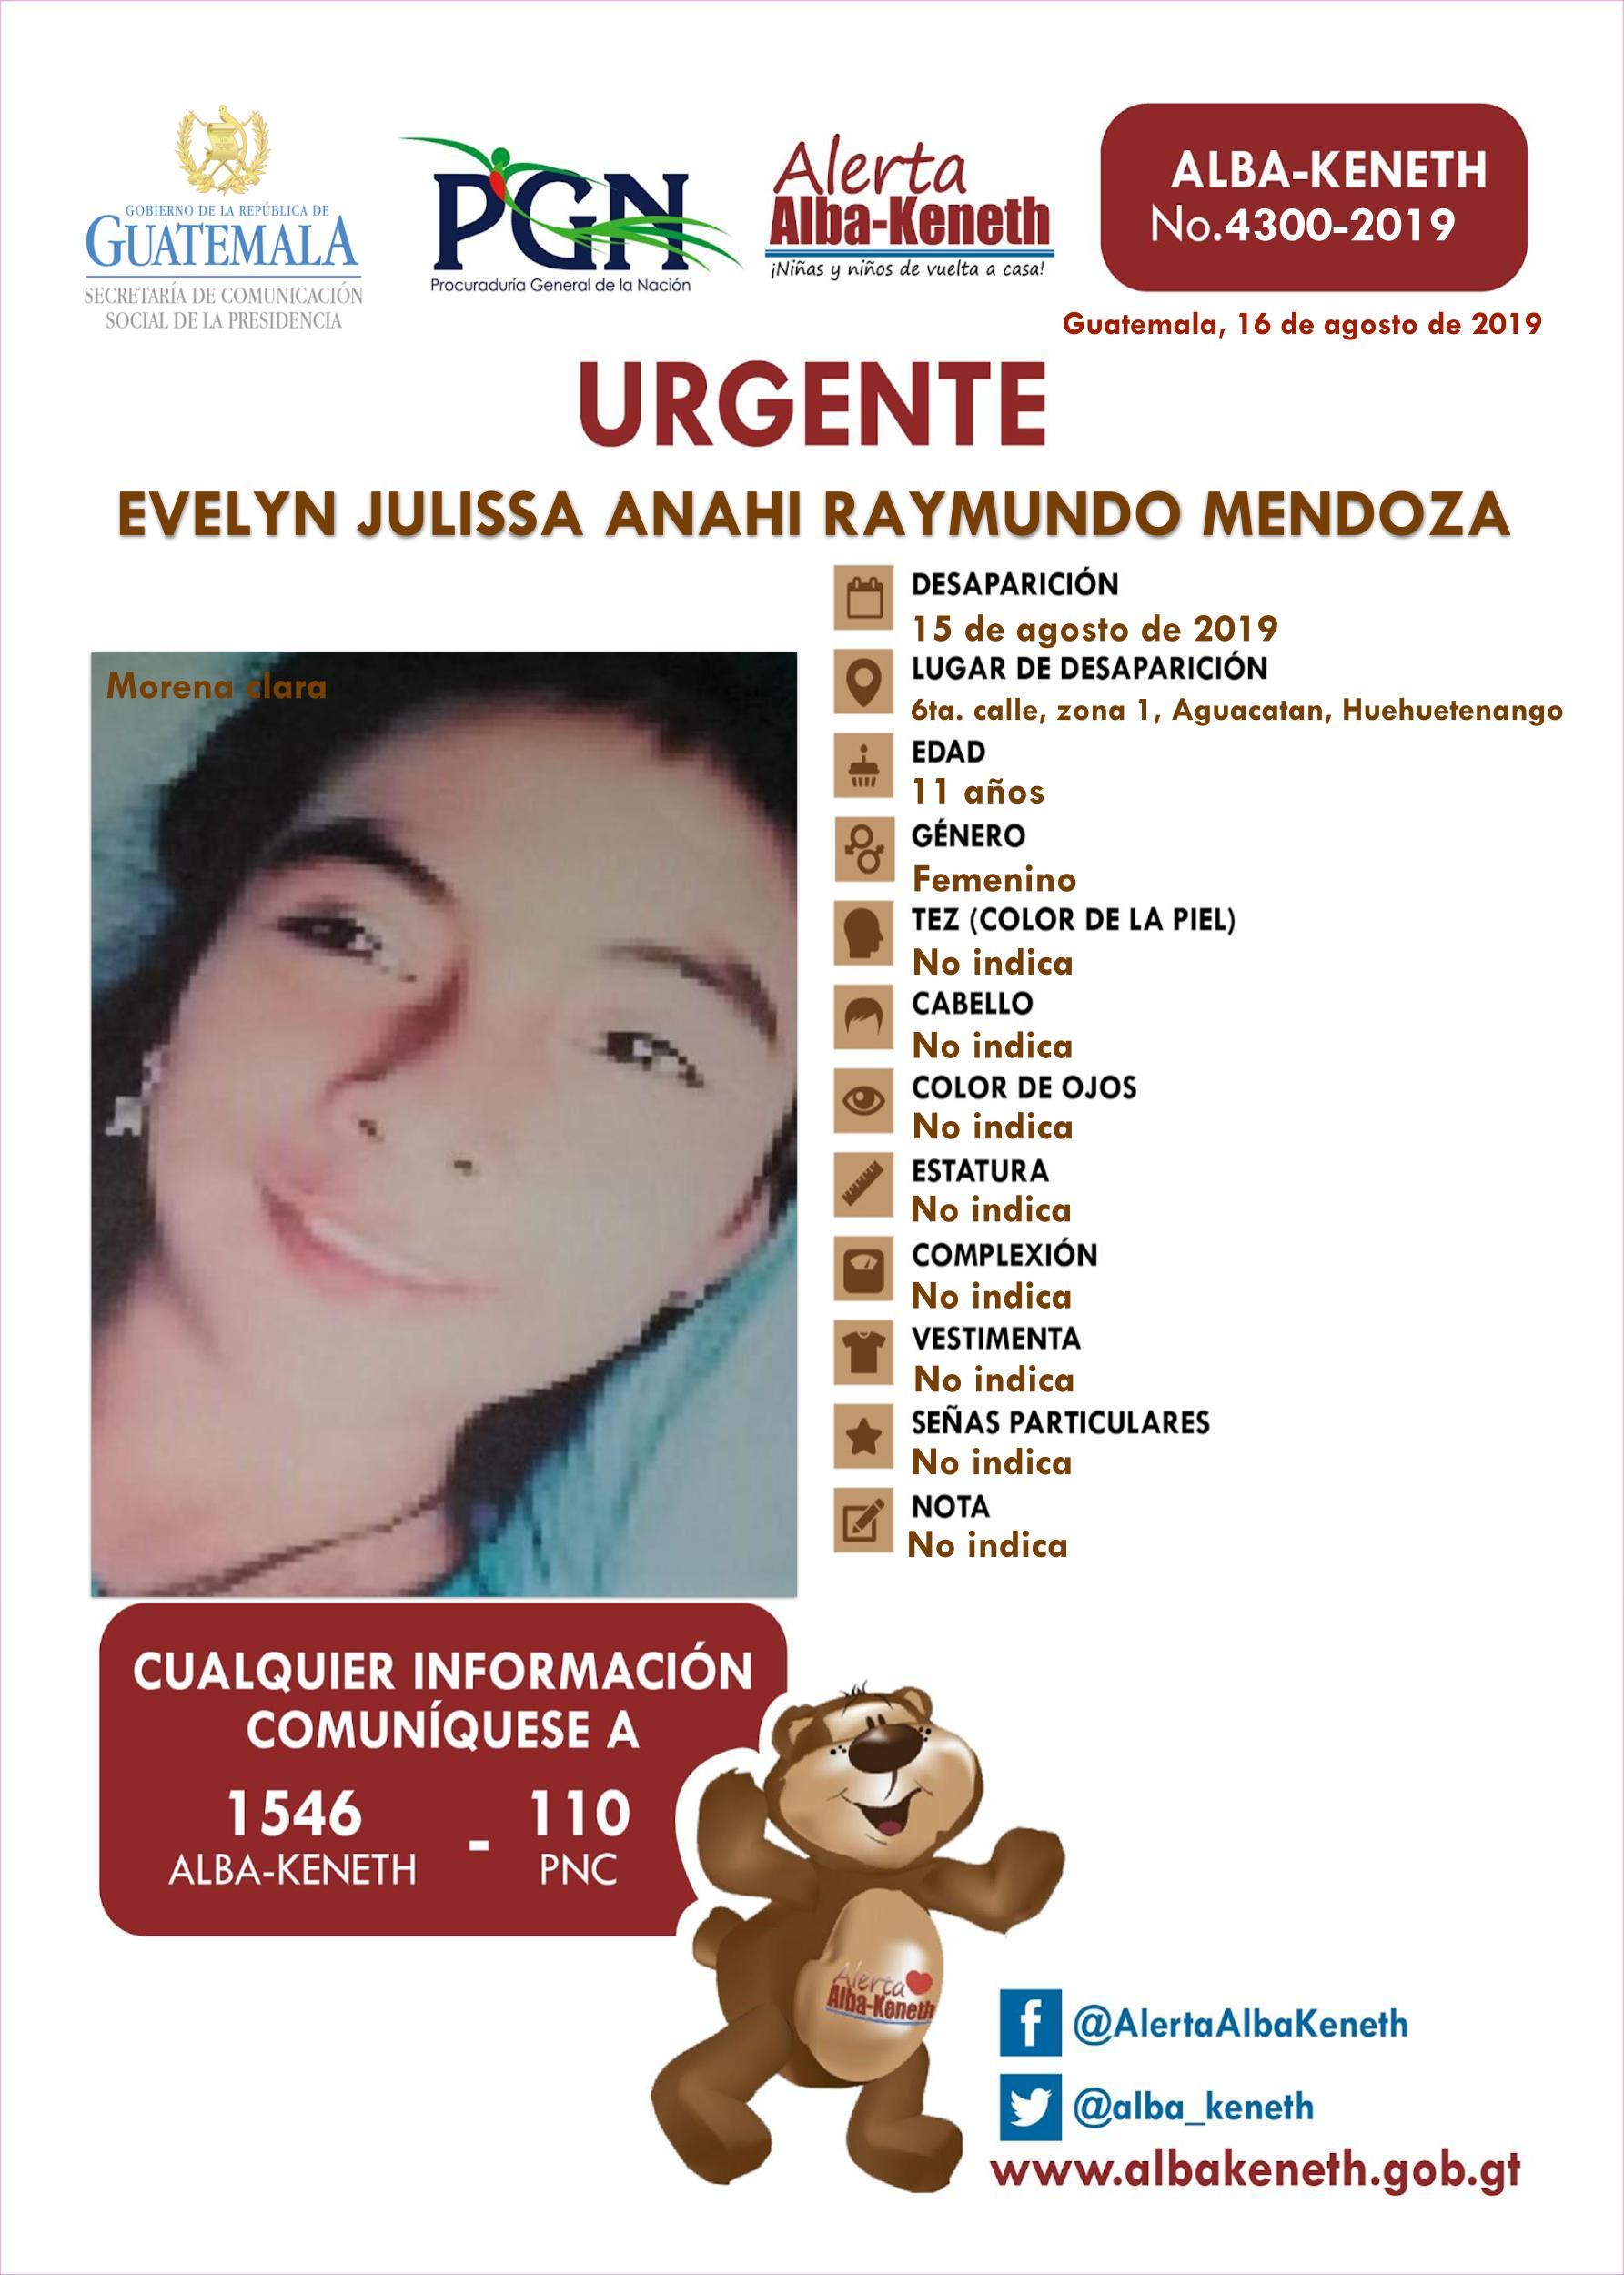 Evelyn Julissa Anahi Raymundo Mendoza